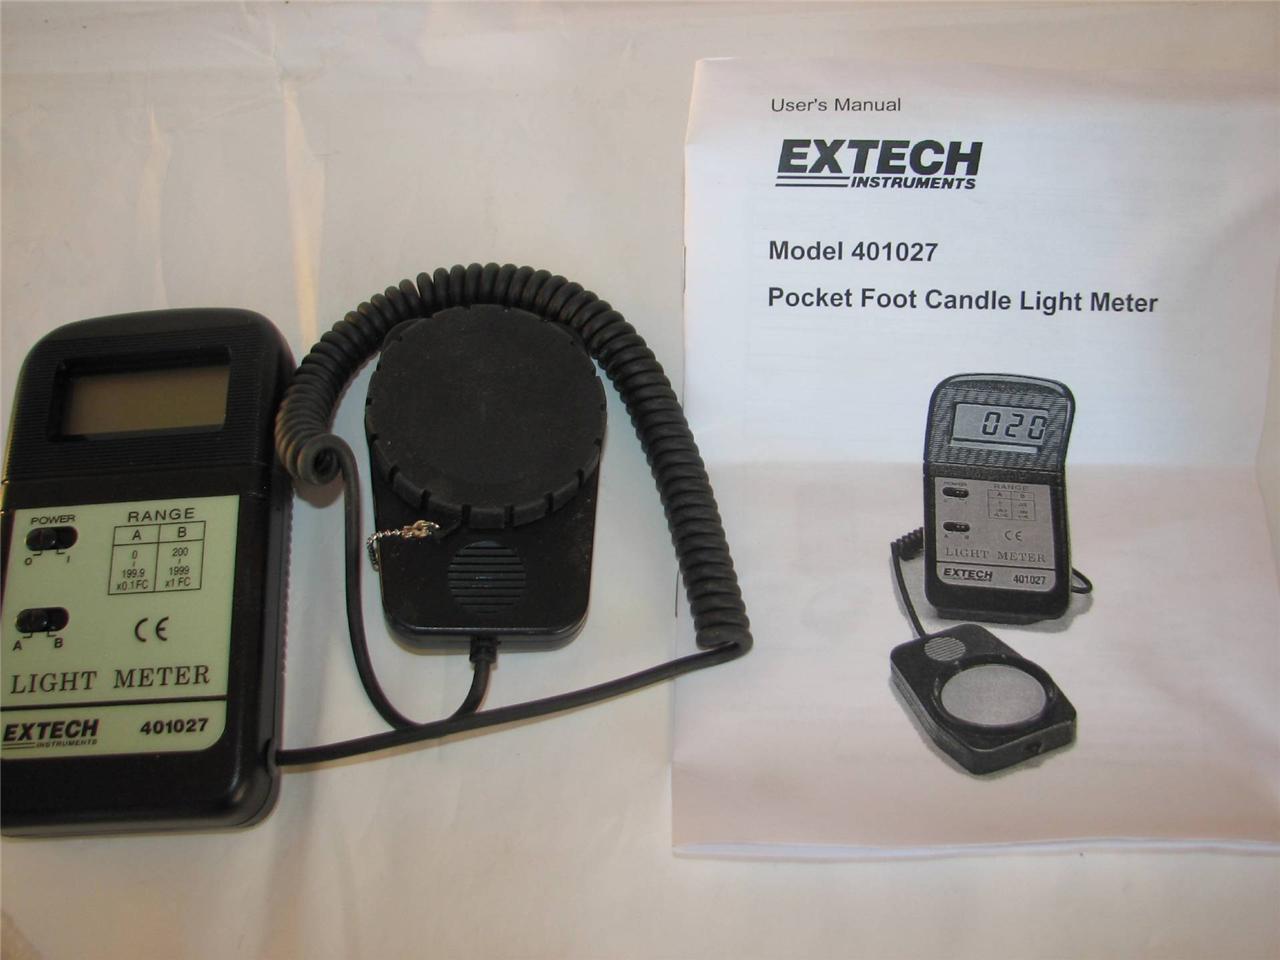 about extech instruments foot candle light meter 401027 light meter. Black Bedroom Furniture Sets. Home Design Ideas